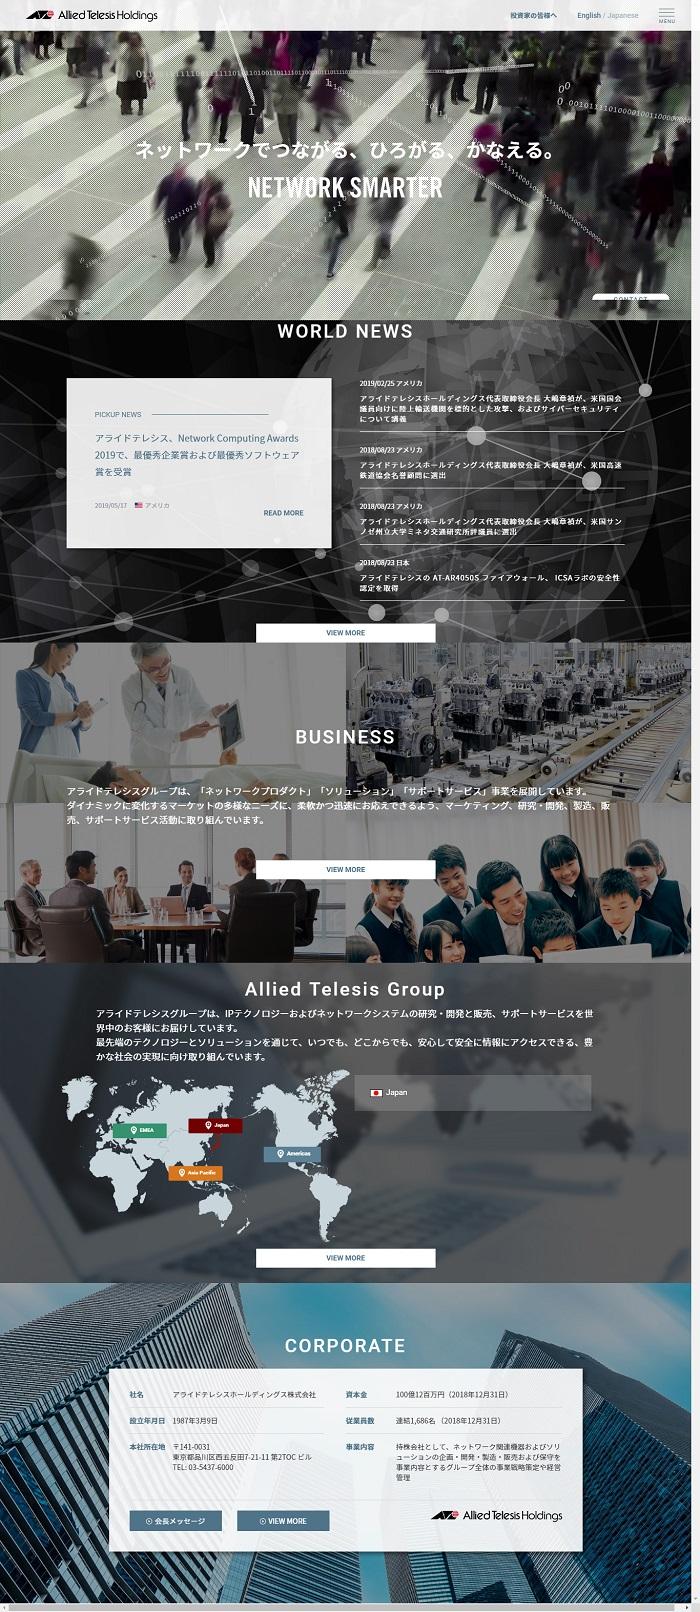 Allied Telesis Group